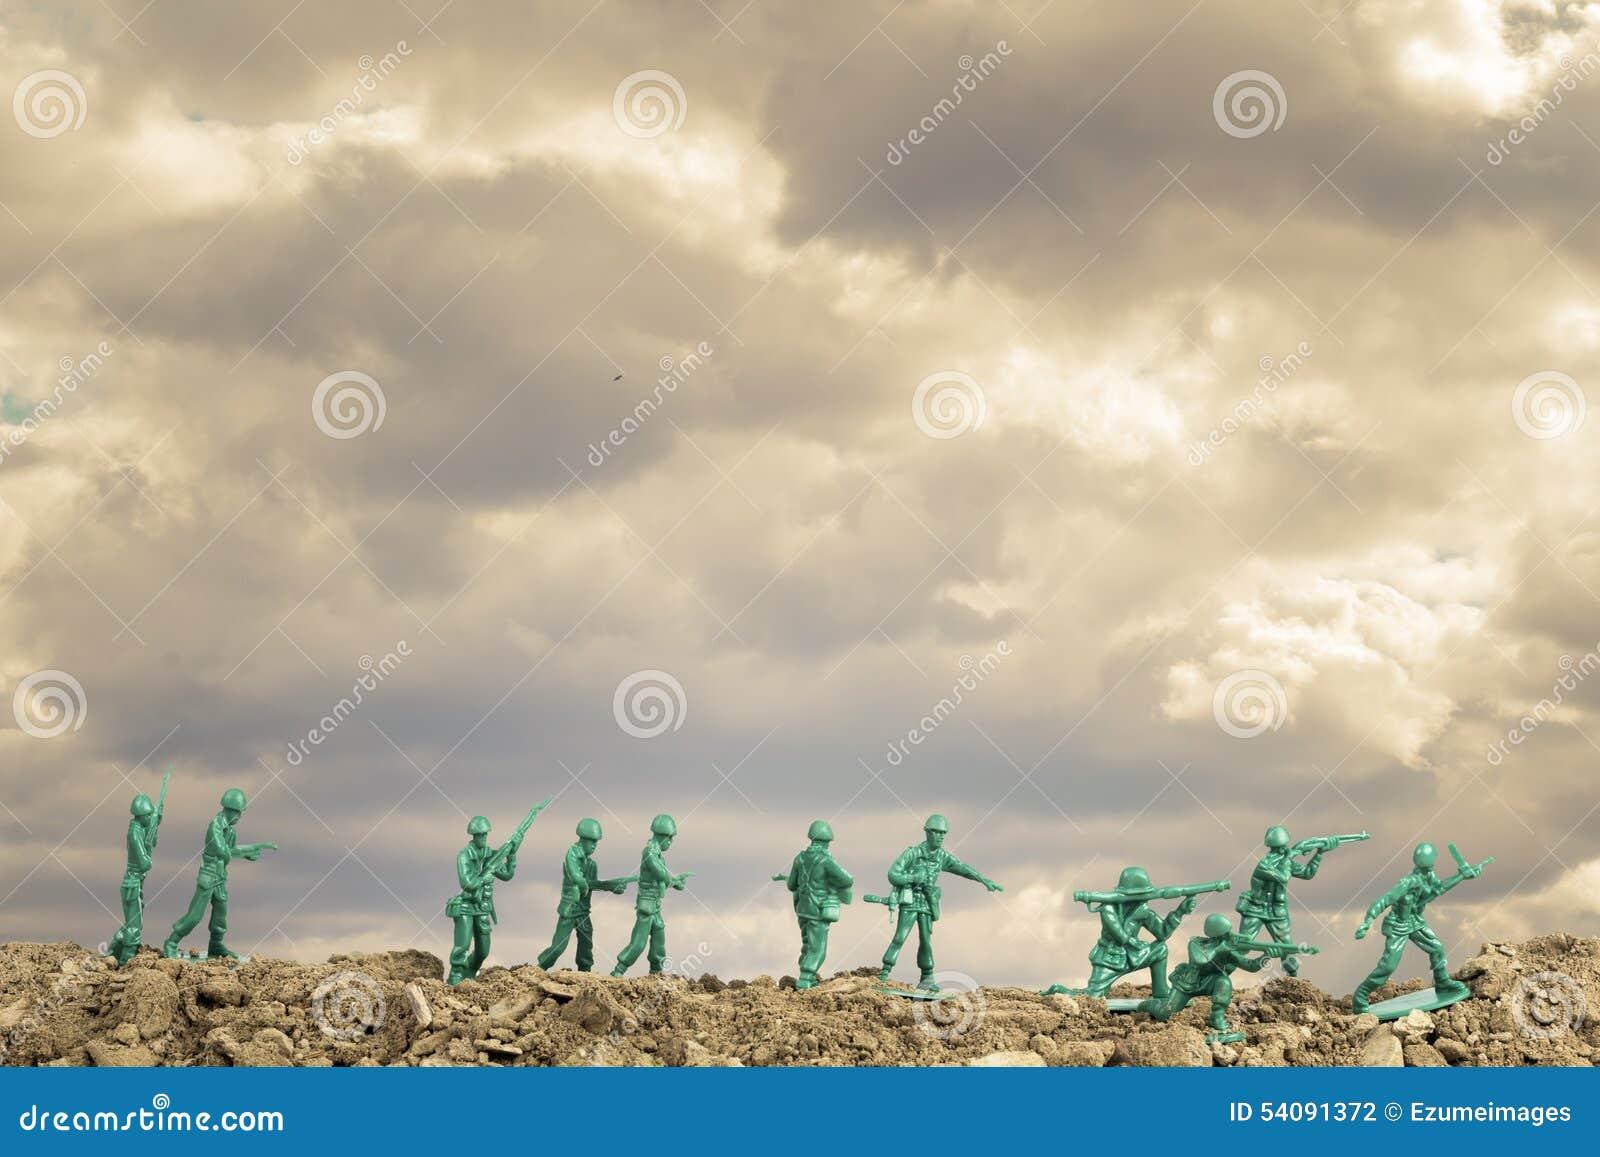 Toy Soldiers War